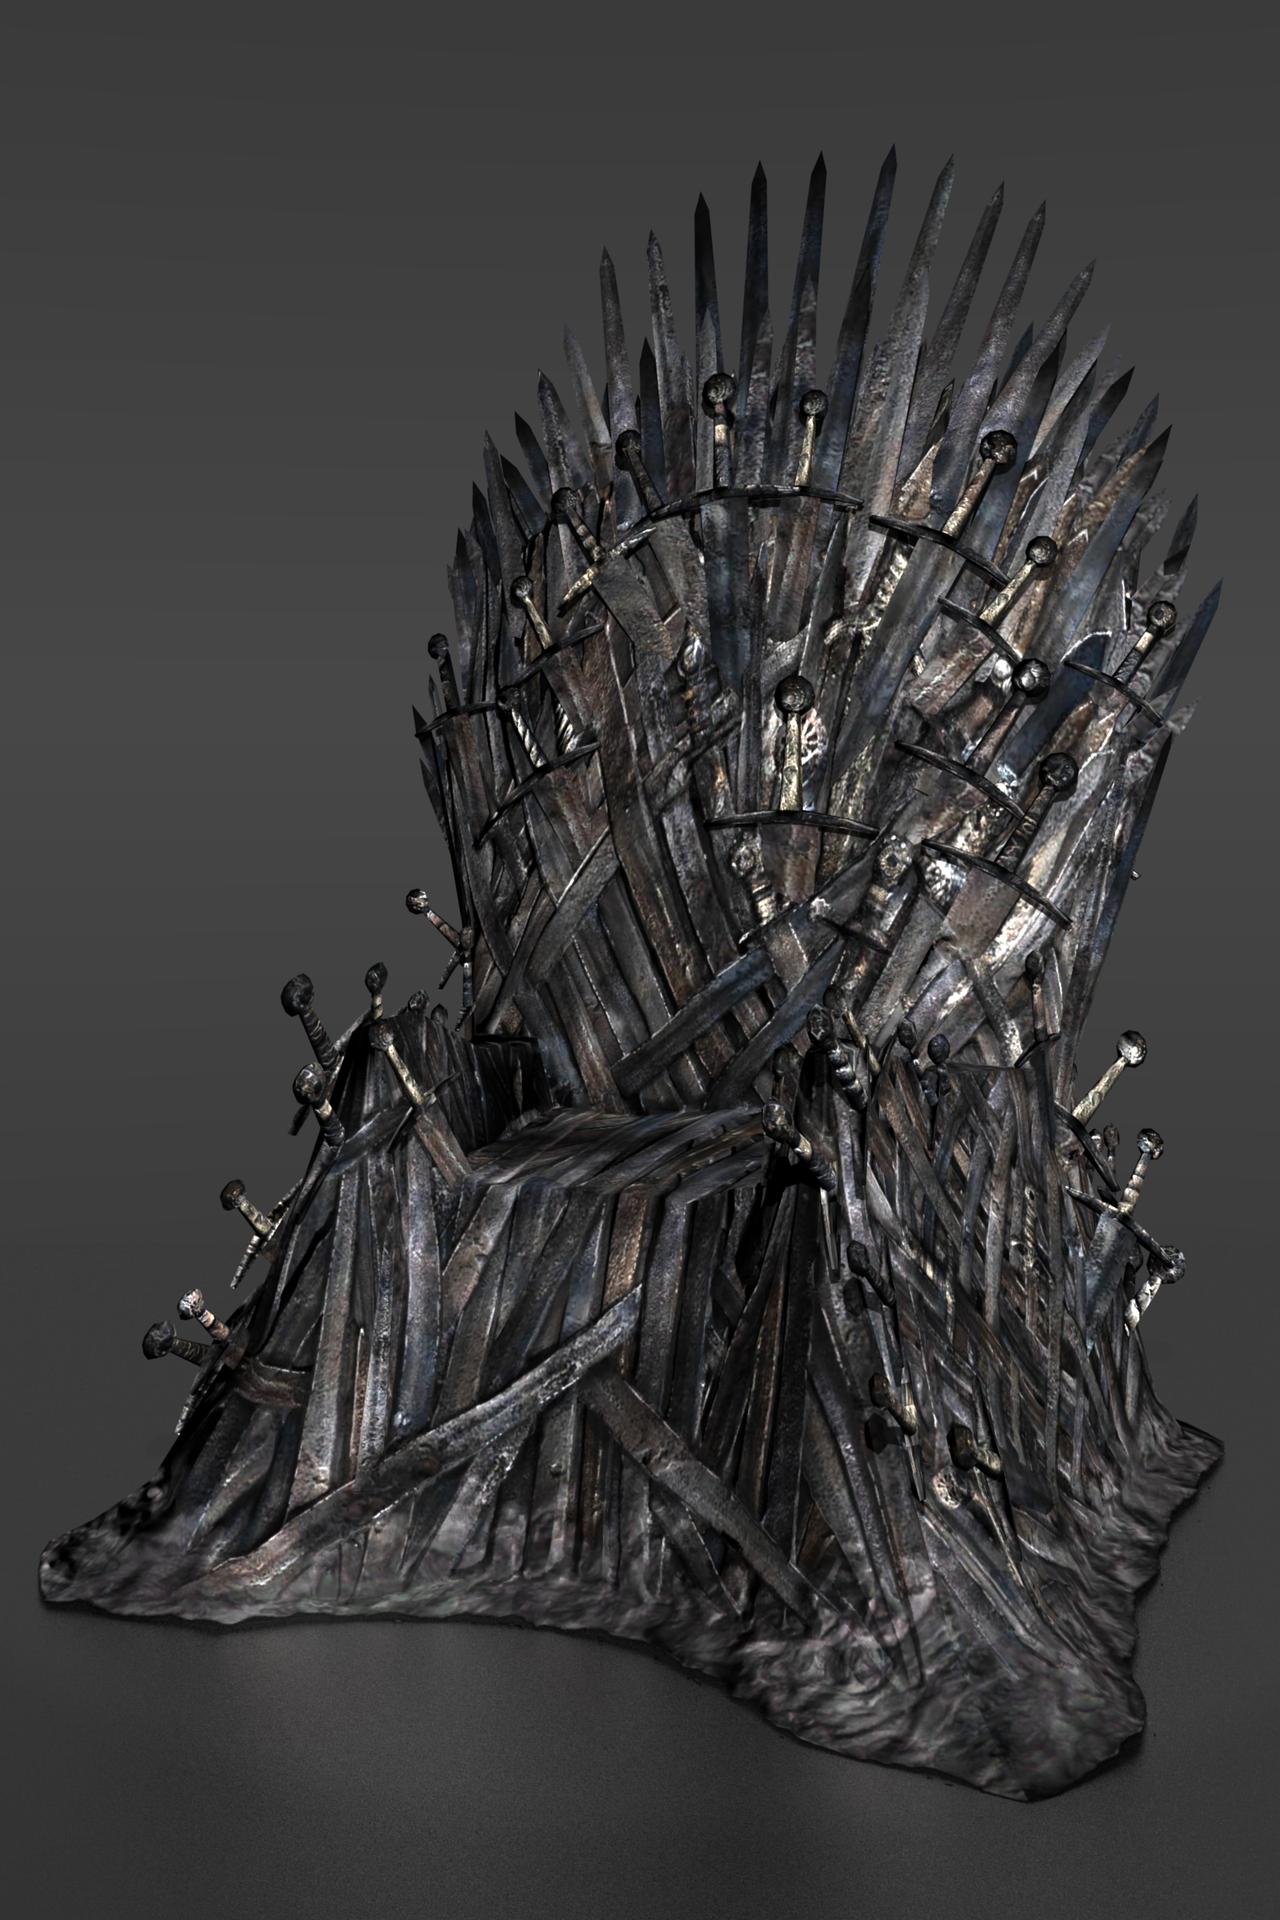 Game of thrones iron throne by ishikahiruma on deviantart for Buy iron throne chair